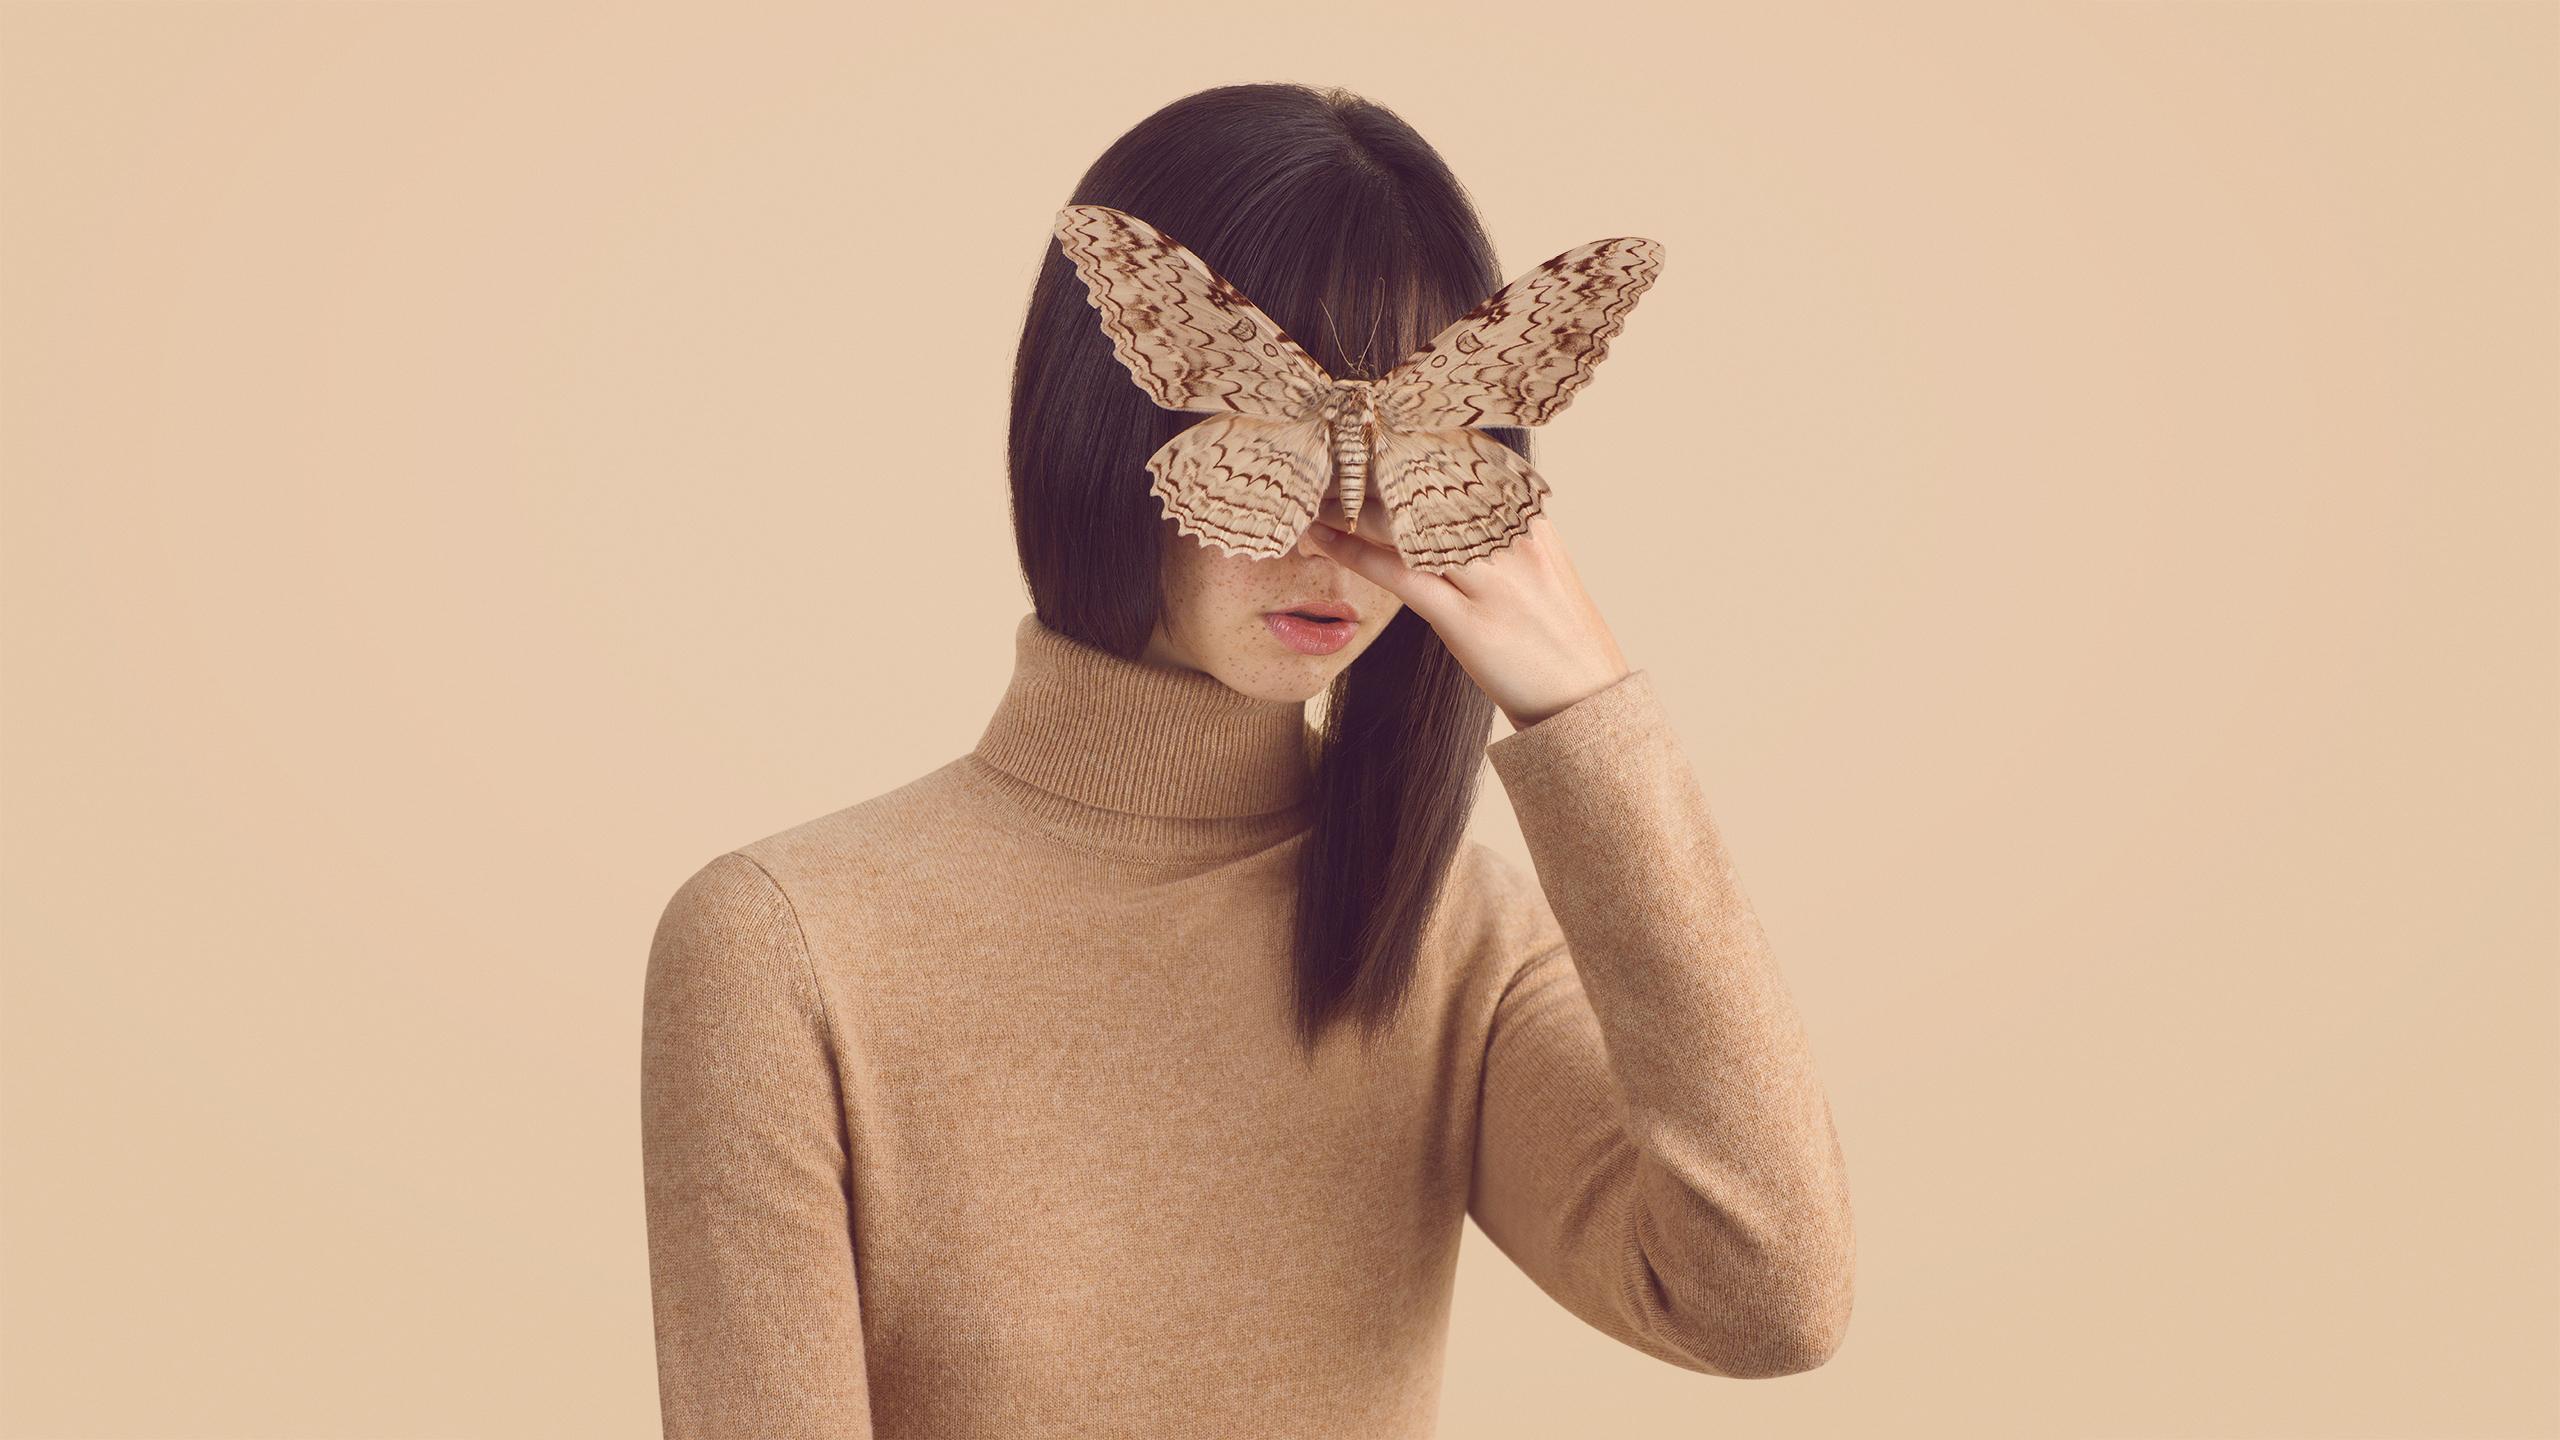 projet-perso-papillon-1